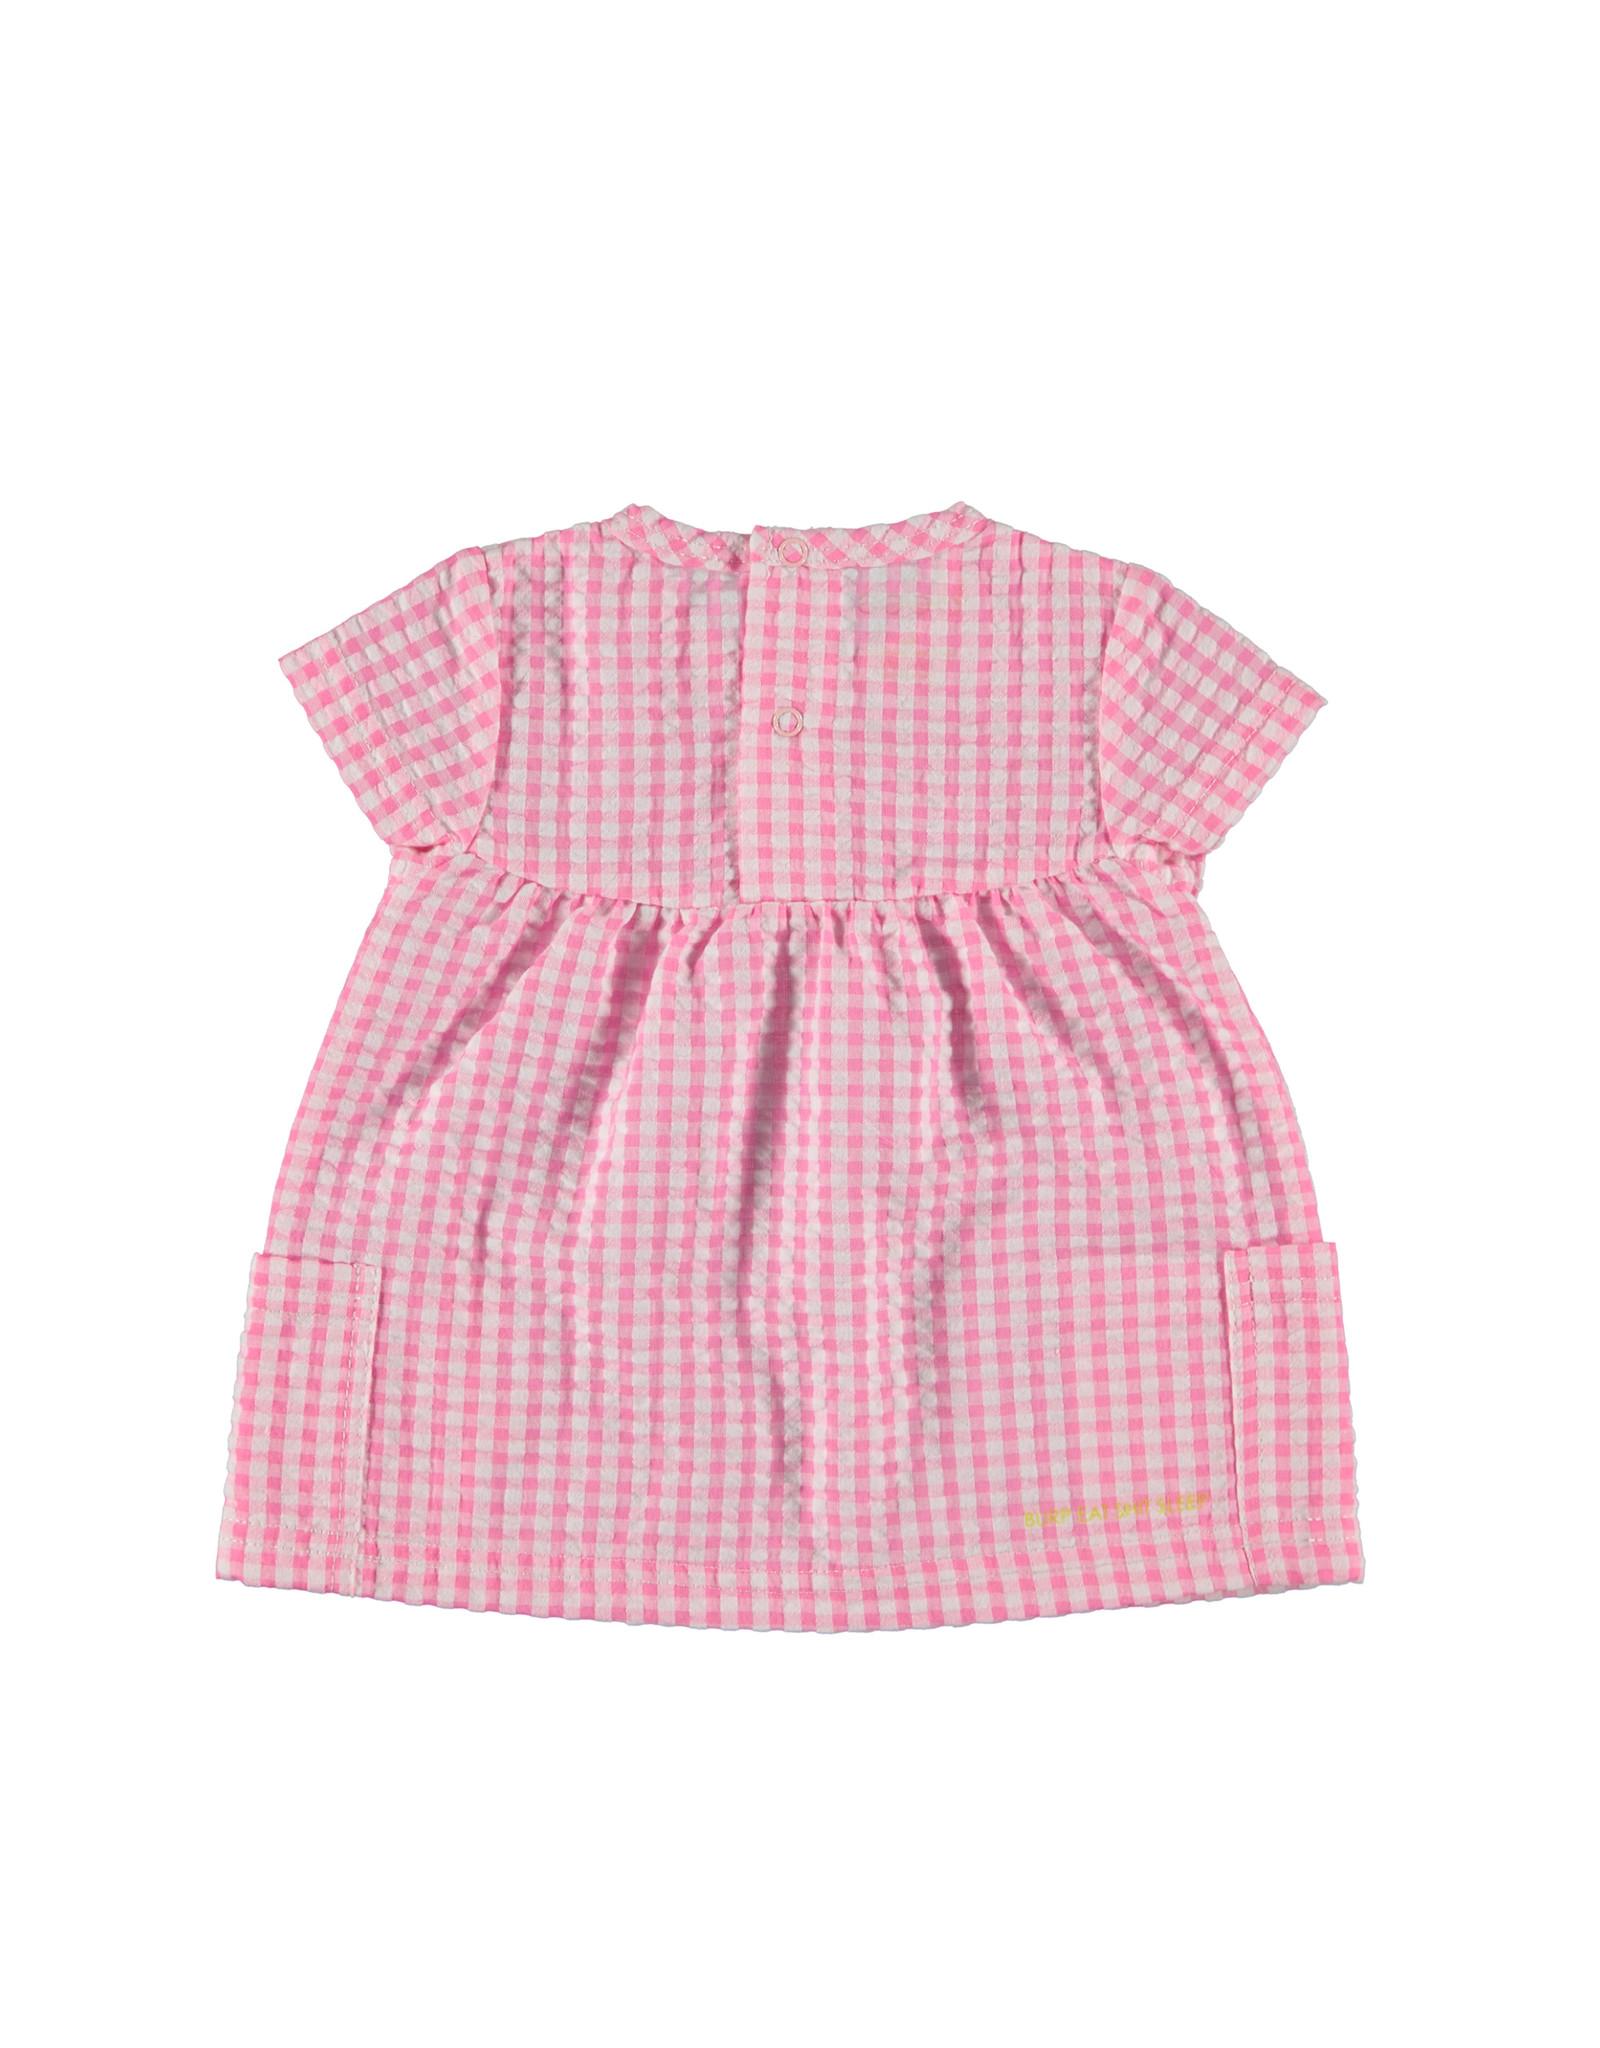 B.E.S.S. Blouse sh.sl. Vichy, Pink